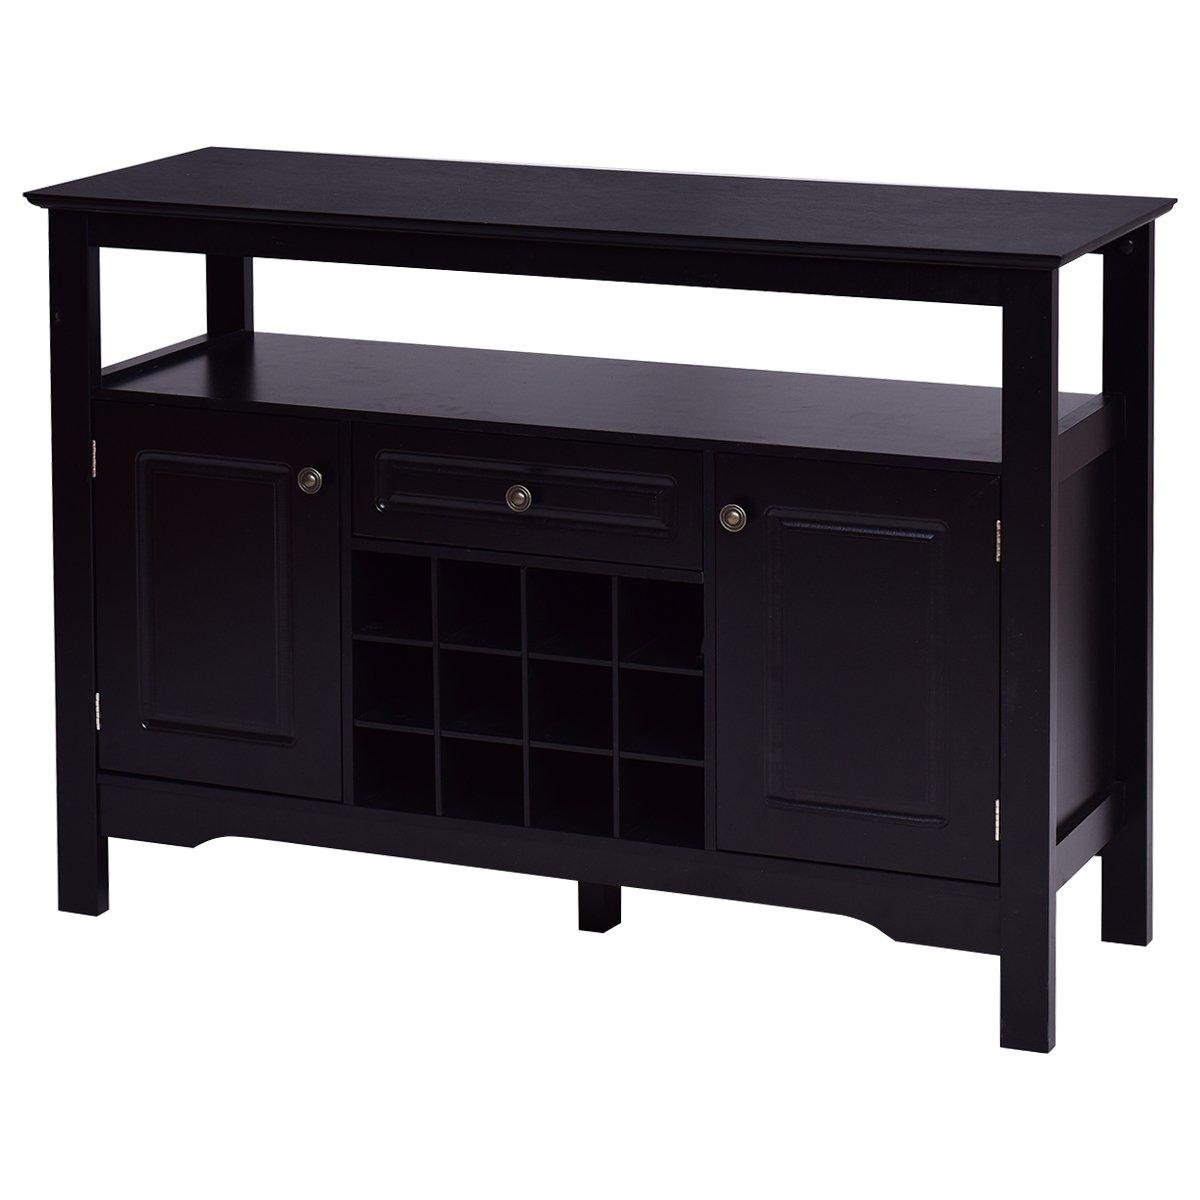 Giantex Black Buffet Server Wood Cabinet Sideboard Cupboard Table With/wine rack